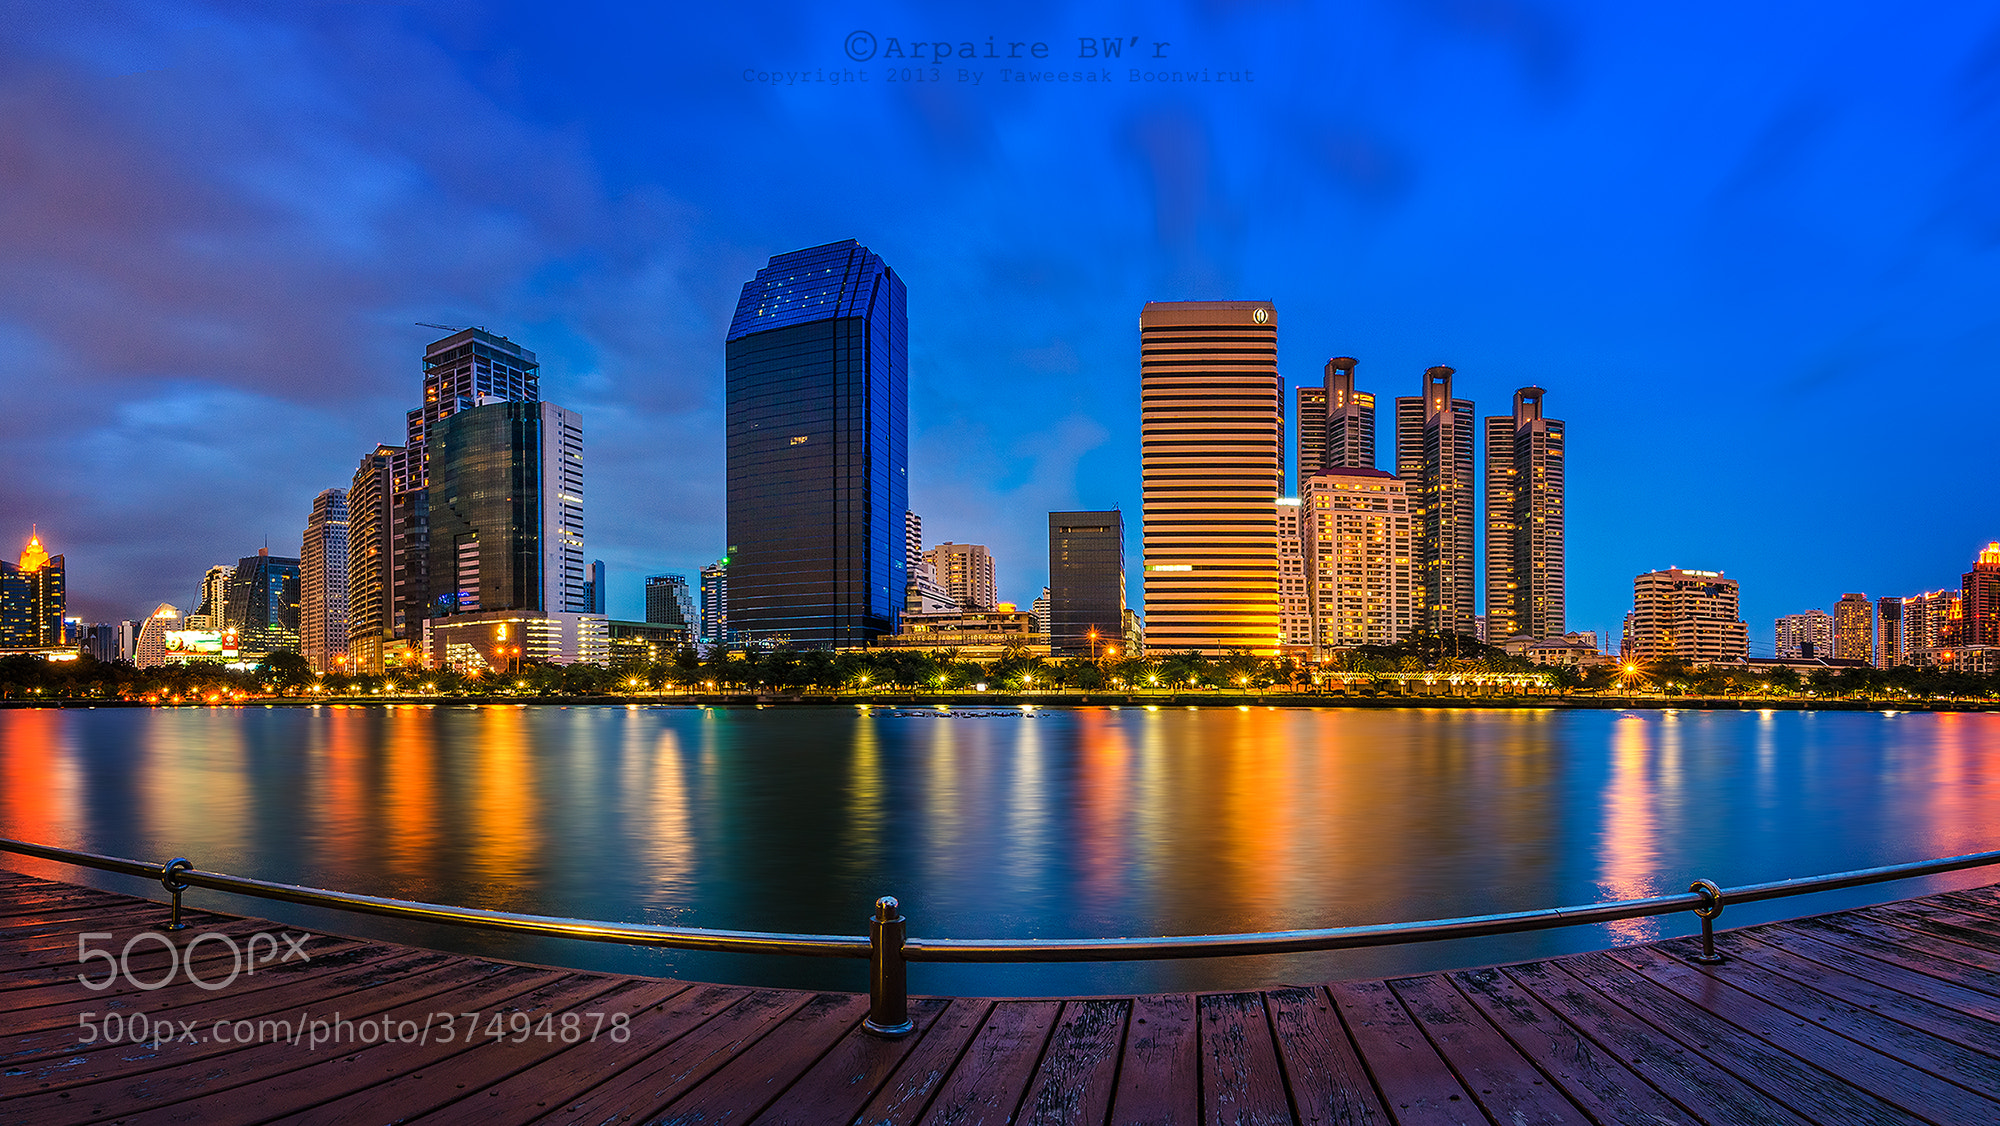 Photograph Bangkok City by Taweesak Boonwirut on 500px